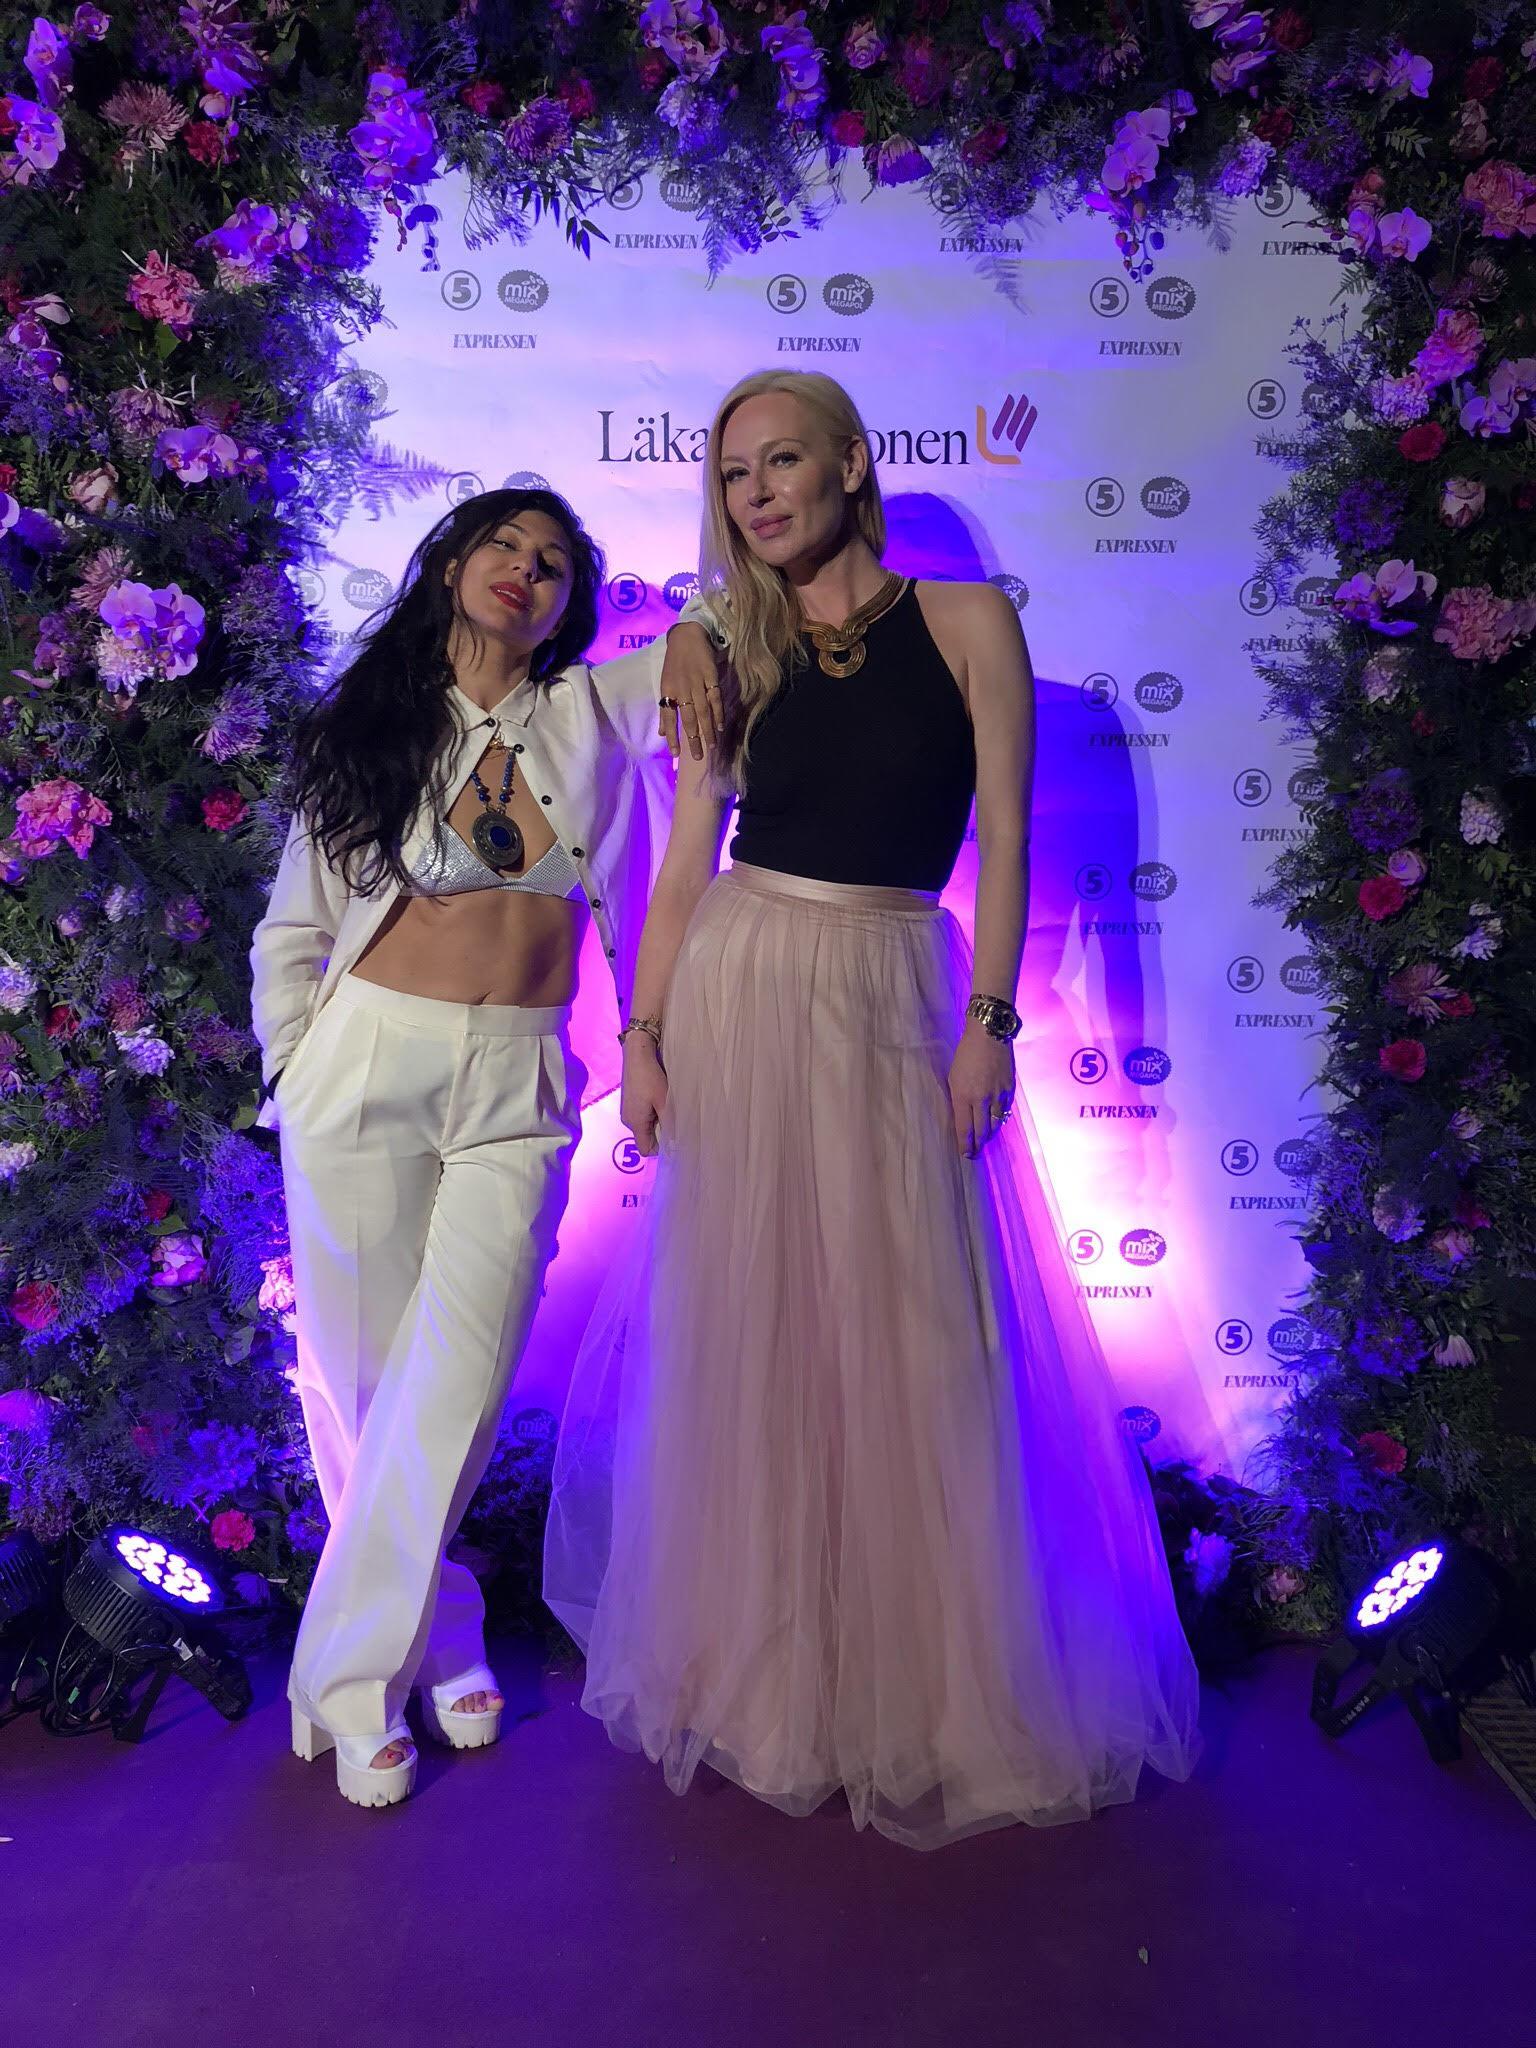 Mammagalan 2018 Bahar Pars Isabel adrain angello